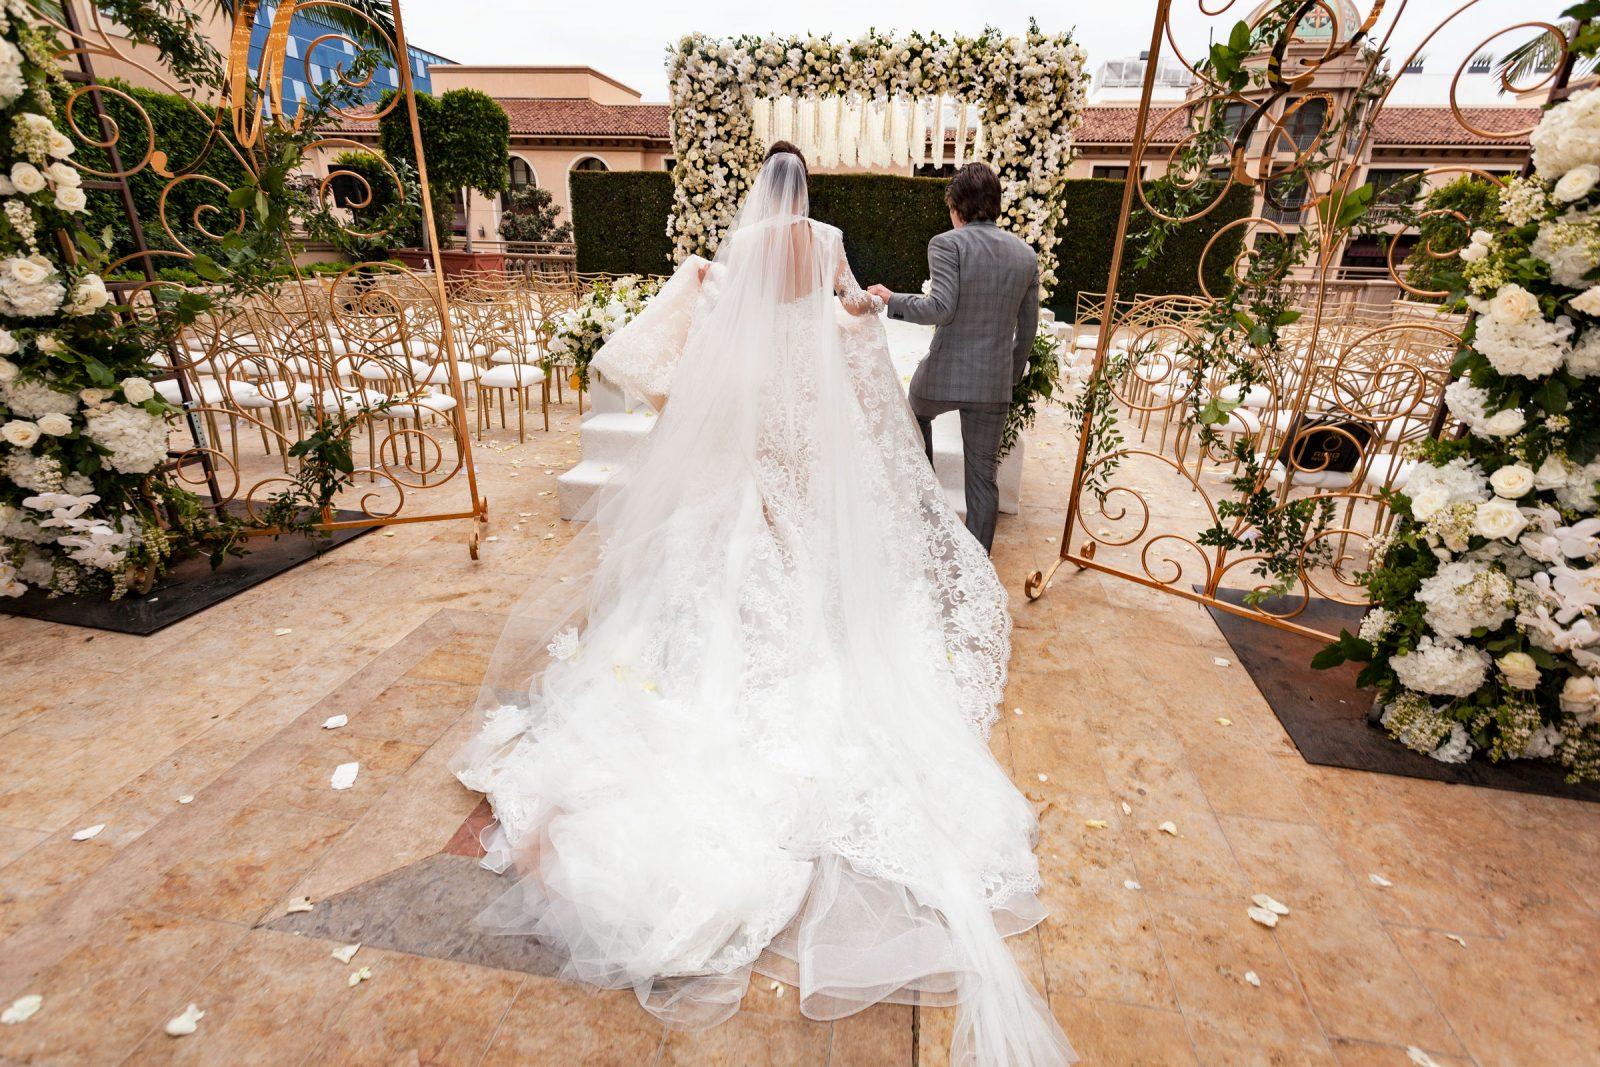 maria-eduardo-montage-beverly-hills-wedding-179.jpg